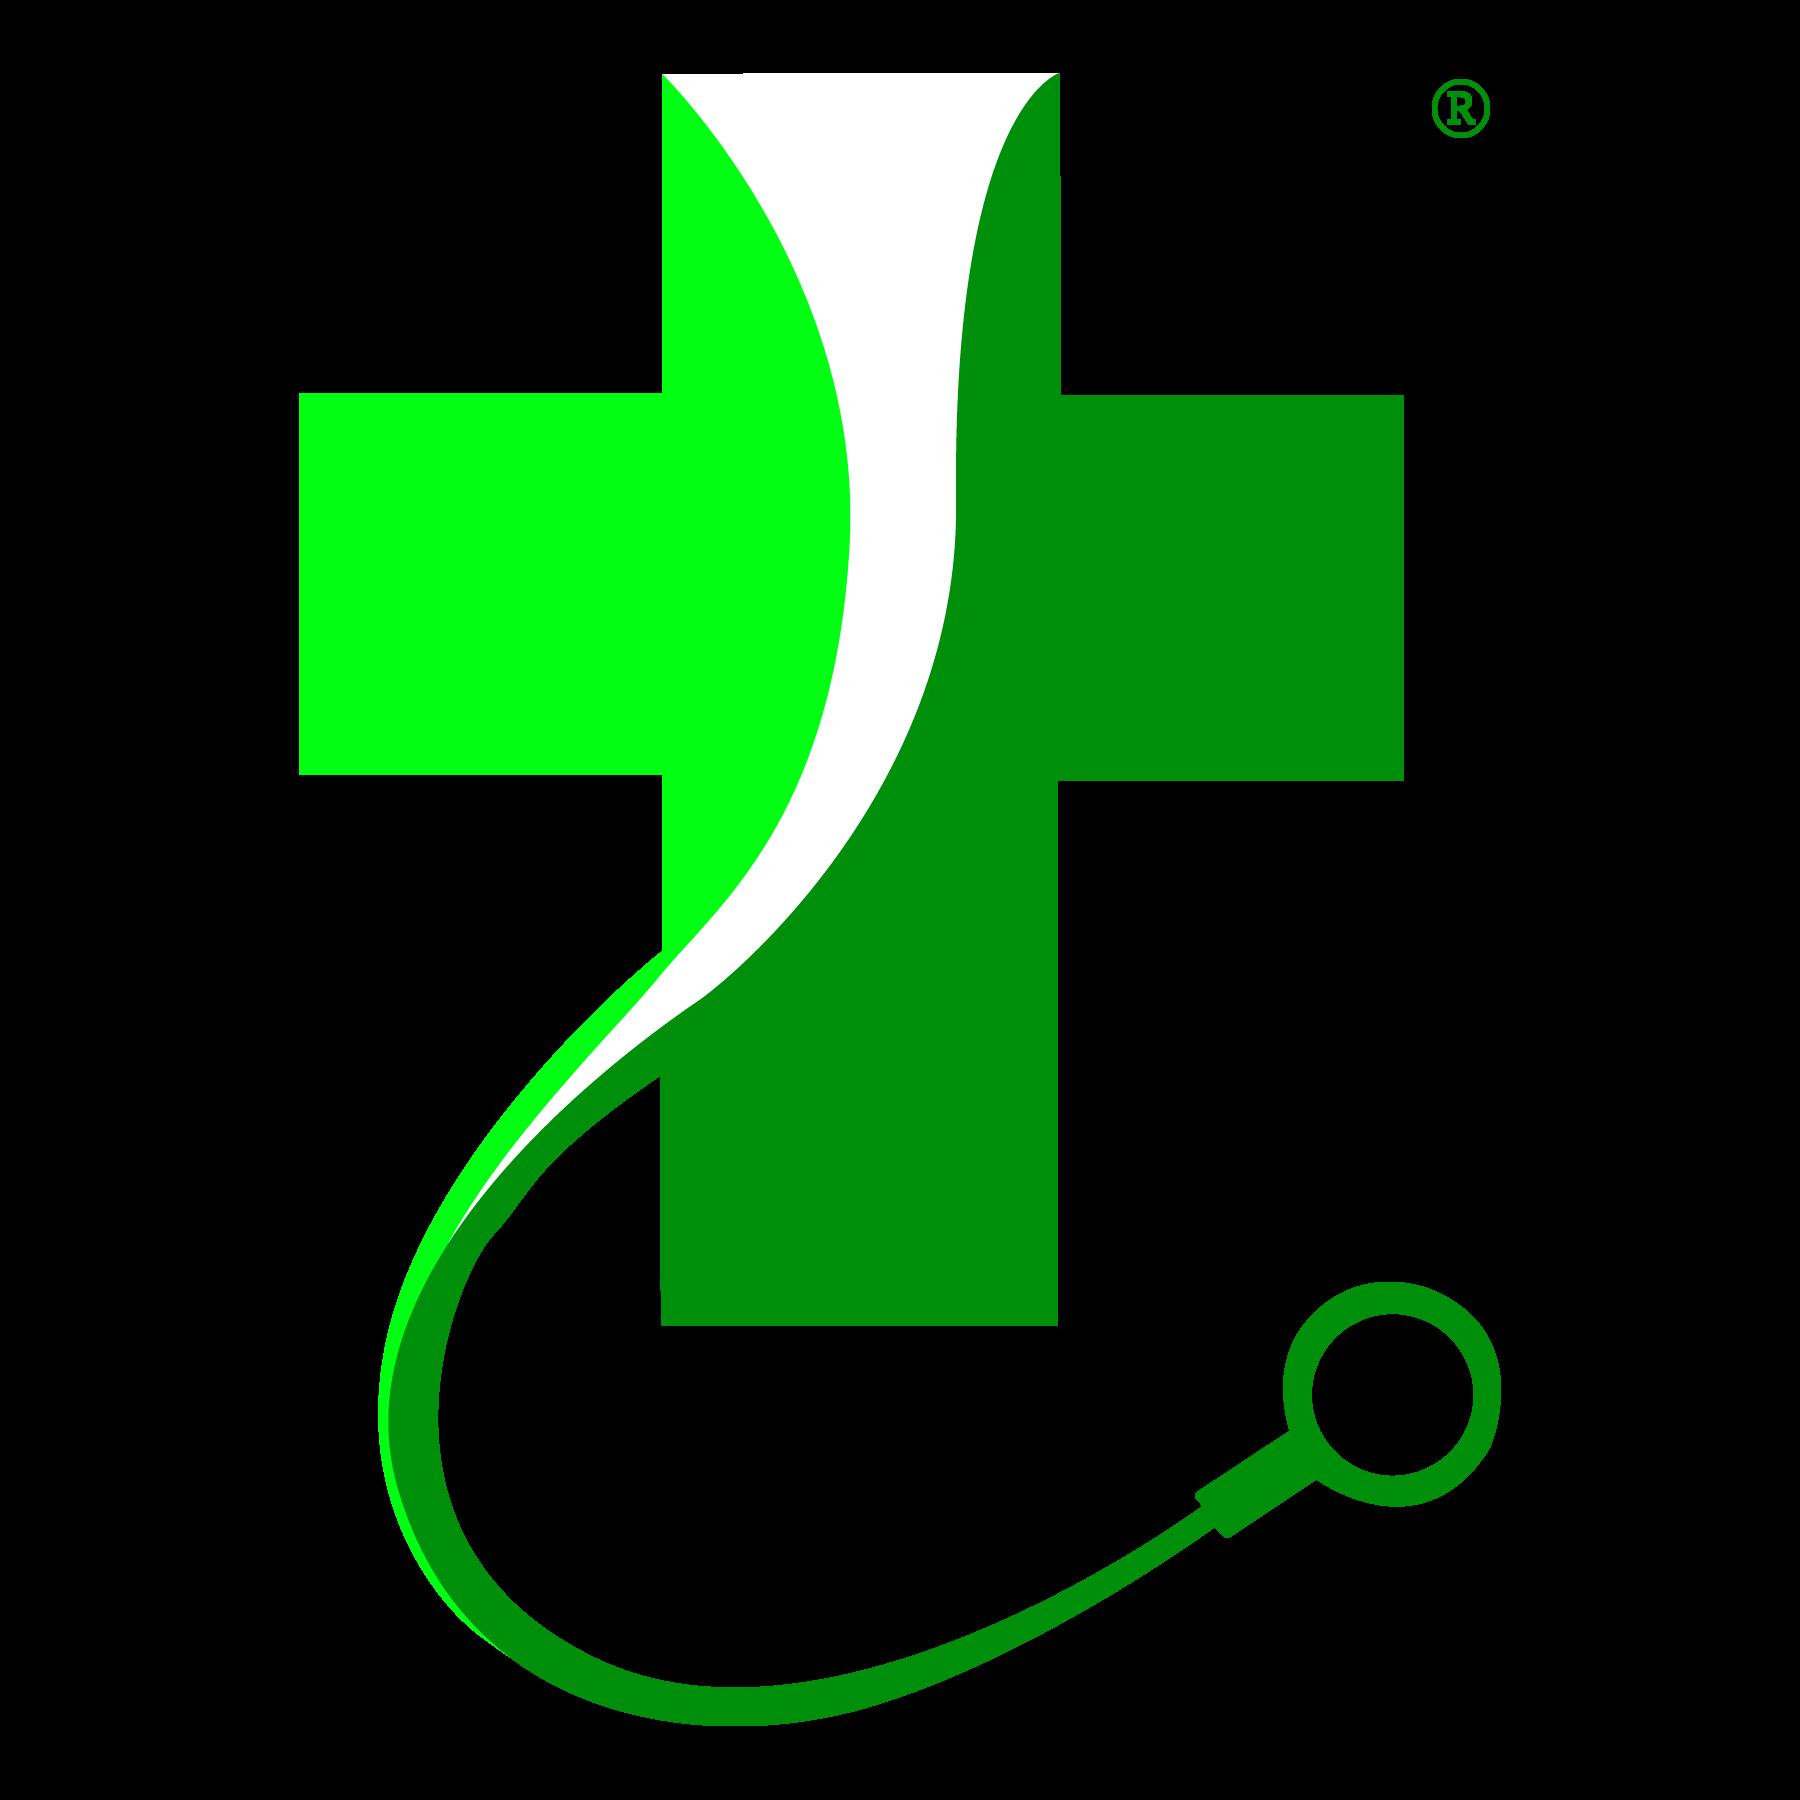 doctors medicine Doctor Logo Png Clipart